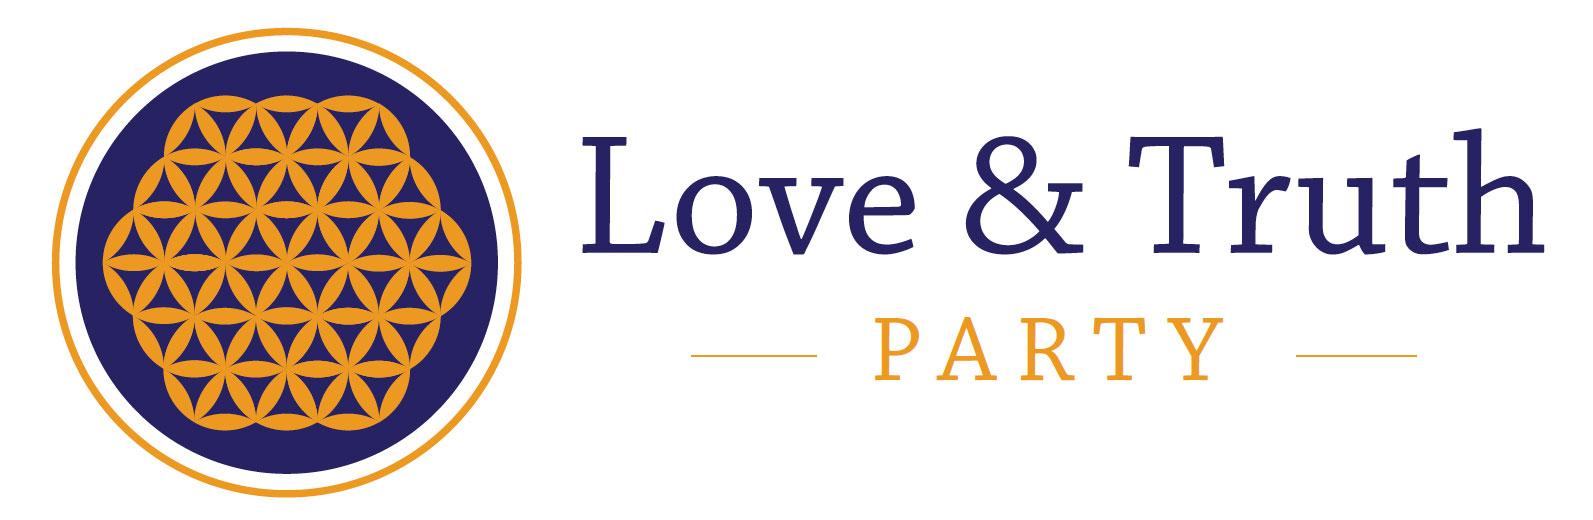 LOVE-&-TRUTH-PARTY LOGO.jpg